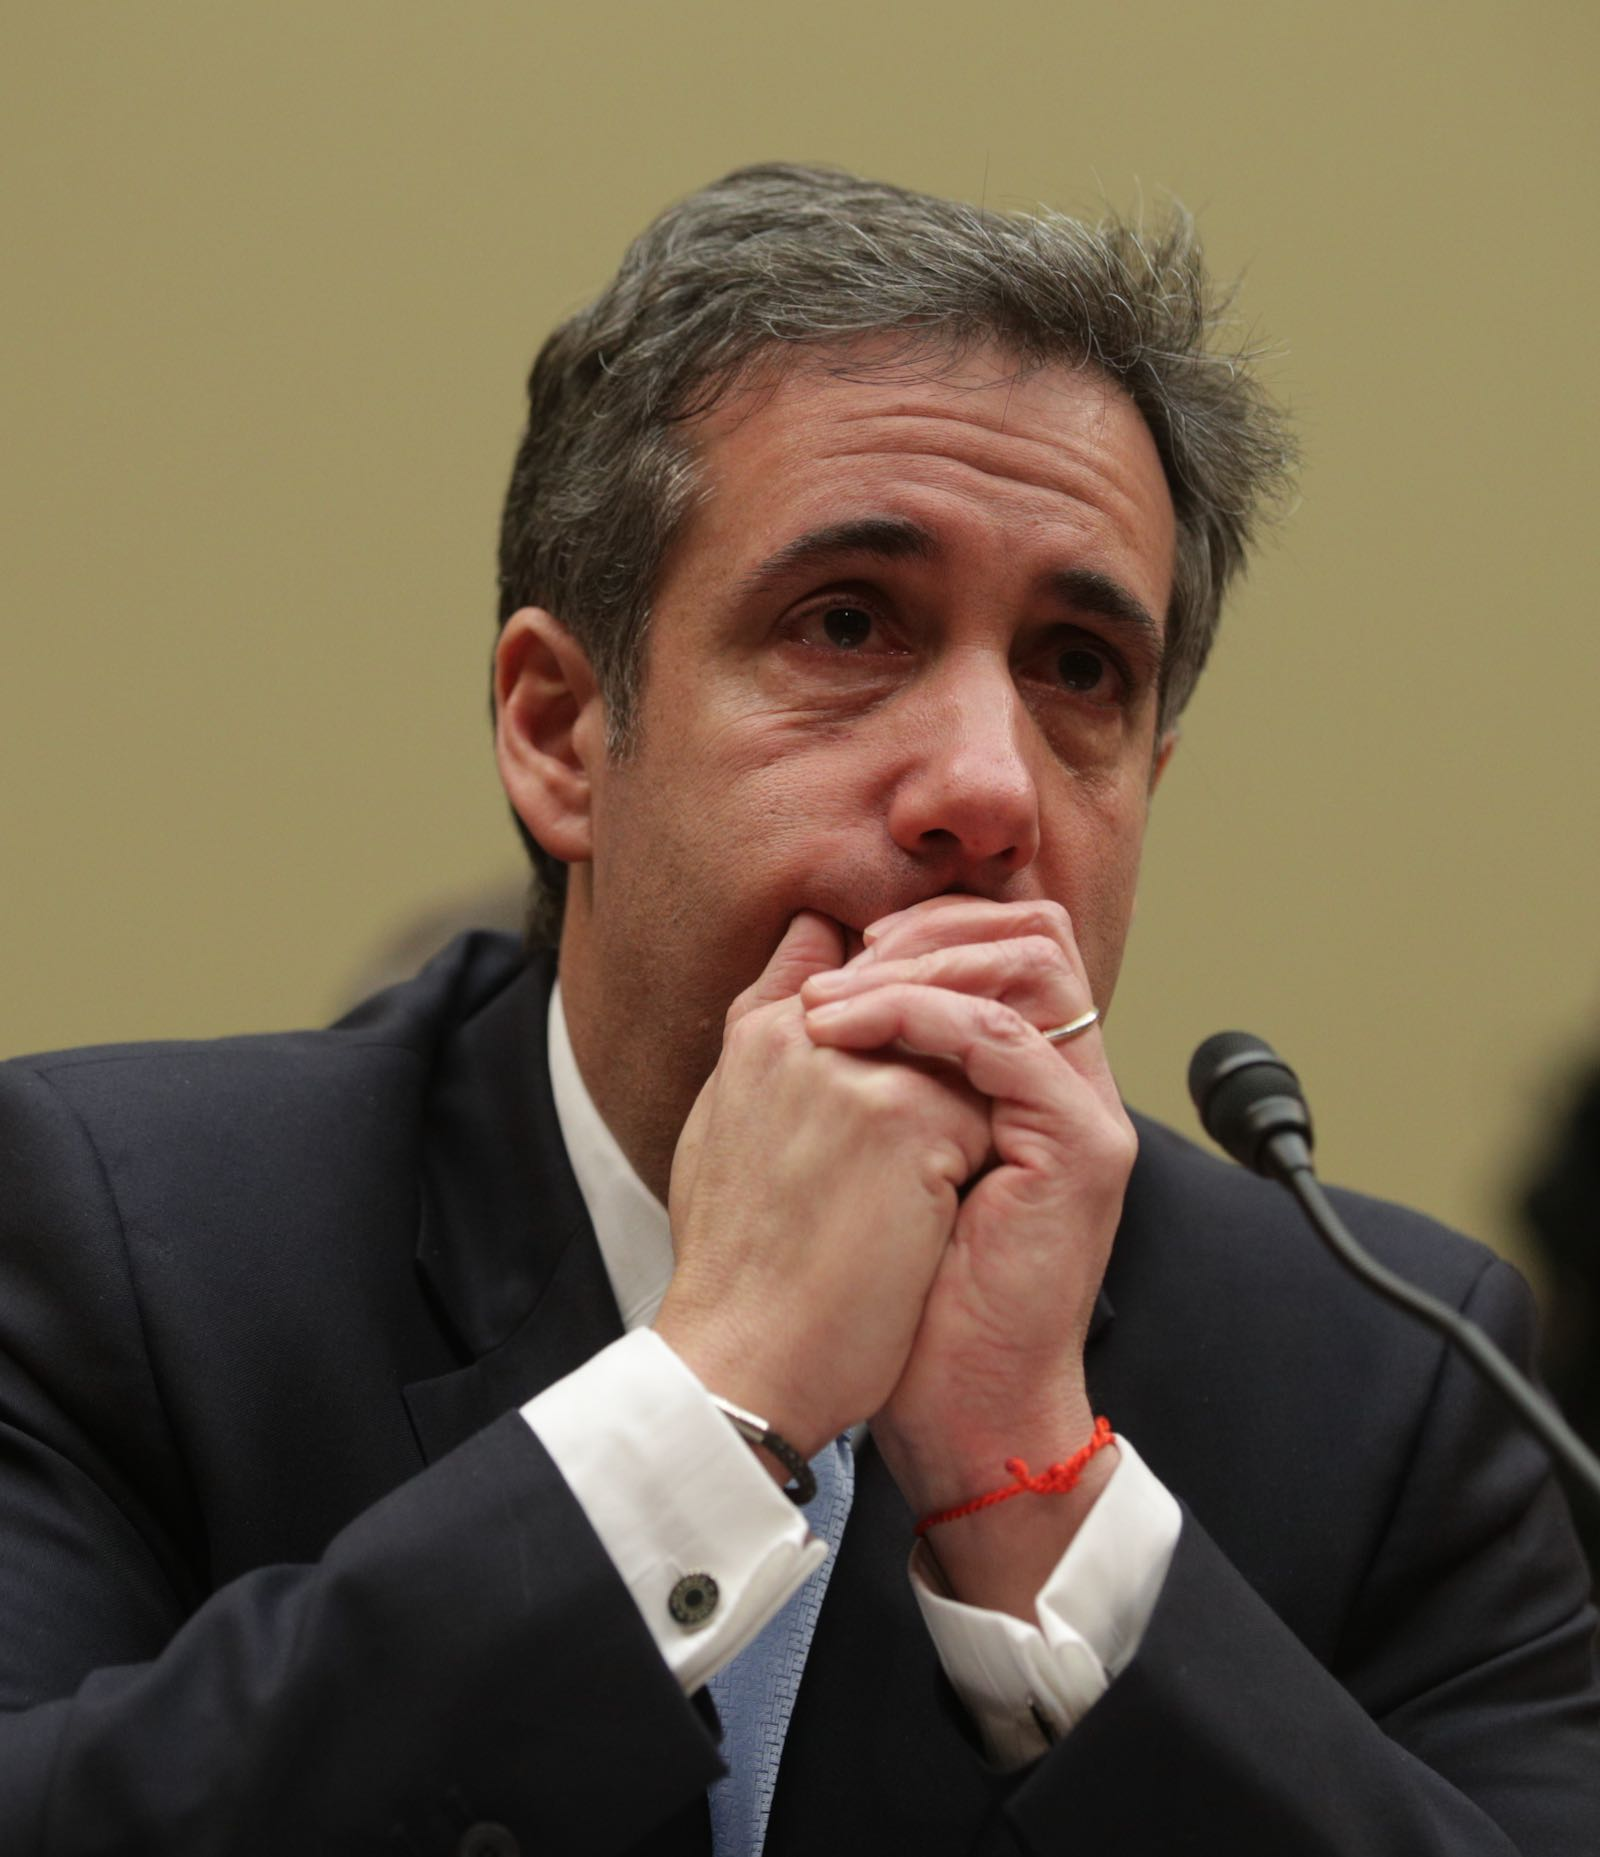 Michael Cohen testifying before Congress